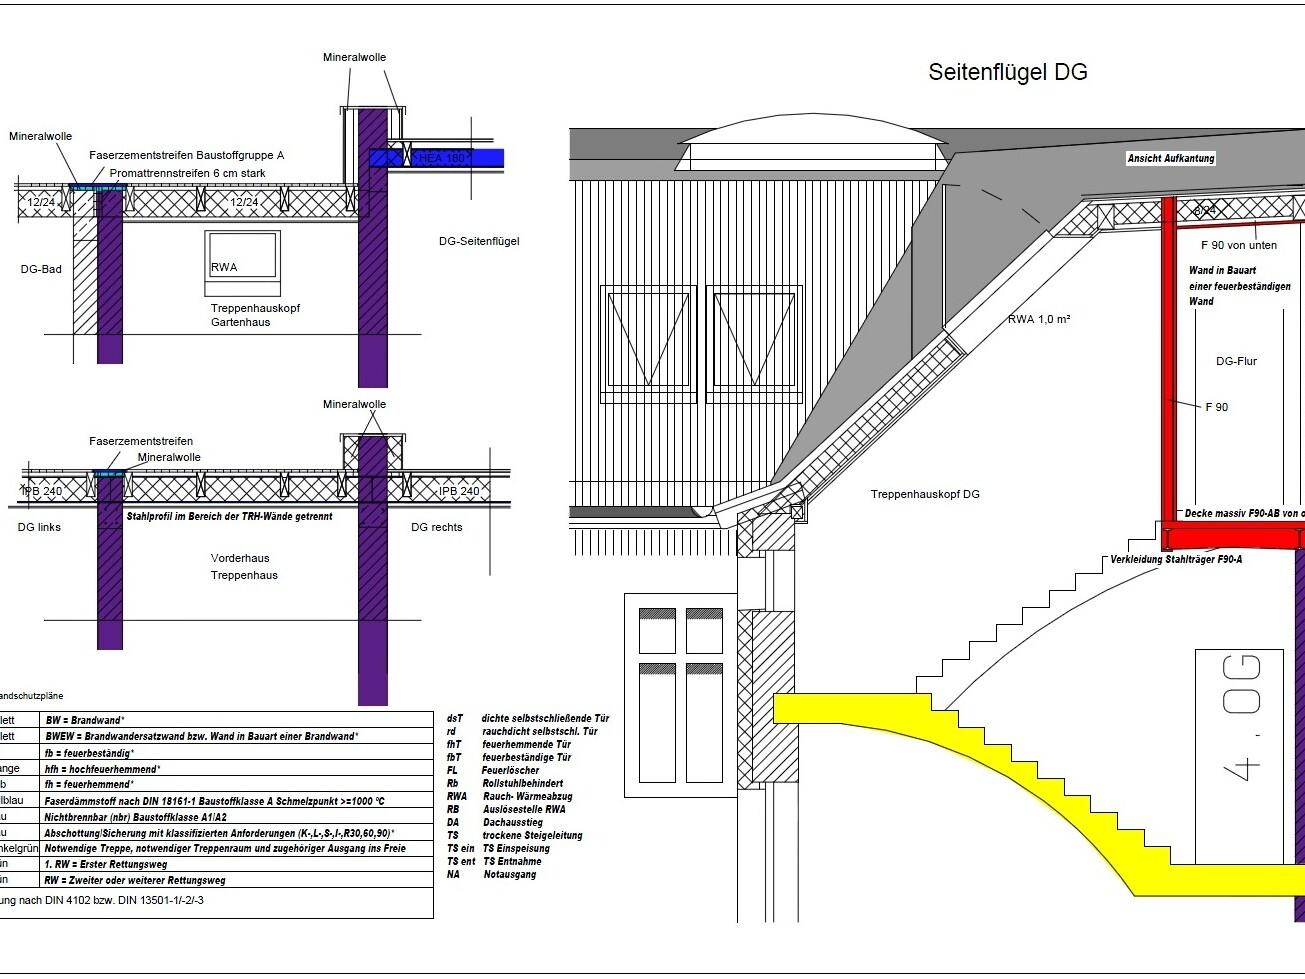 Am Falkplatz 2_Berlin-Prenzlauer Berg_Modernisierung Mehrfamilienhaus_brandschutz plus eberl-pacan_brandschutzkonzept DG